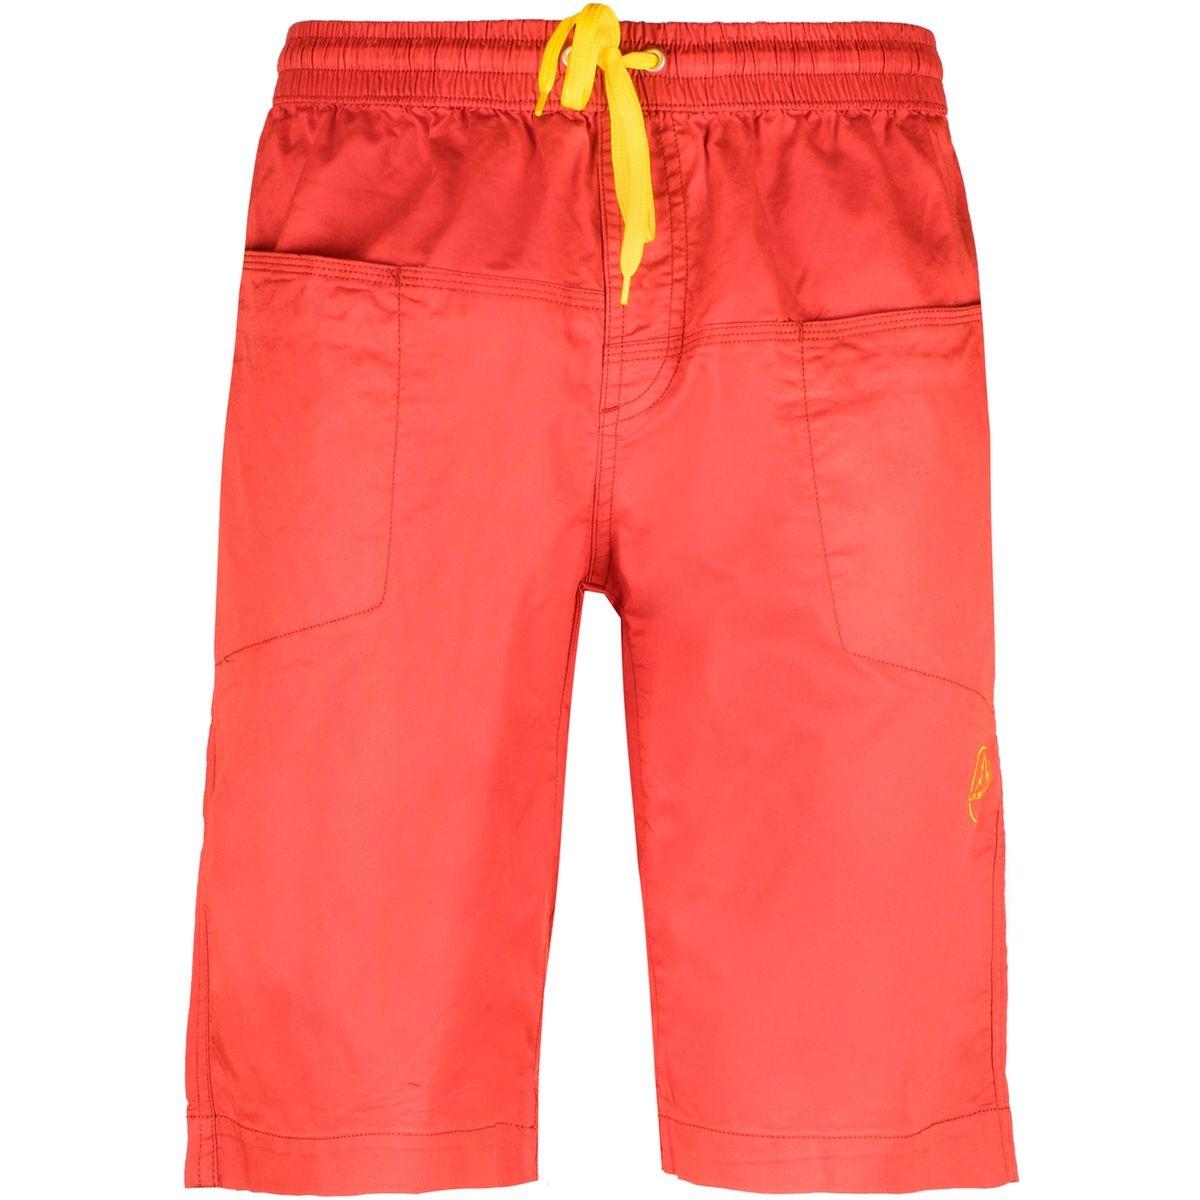 Levanto - Shorts Homme - rouge